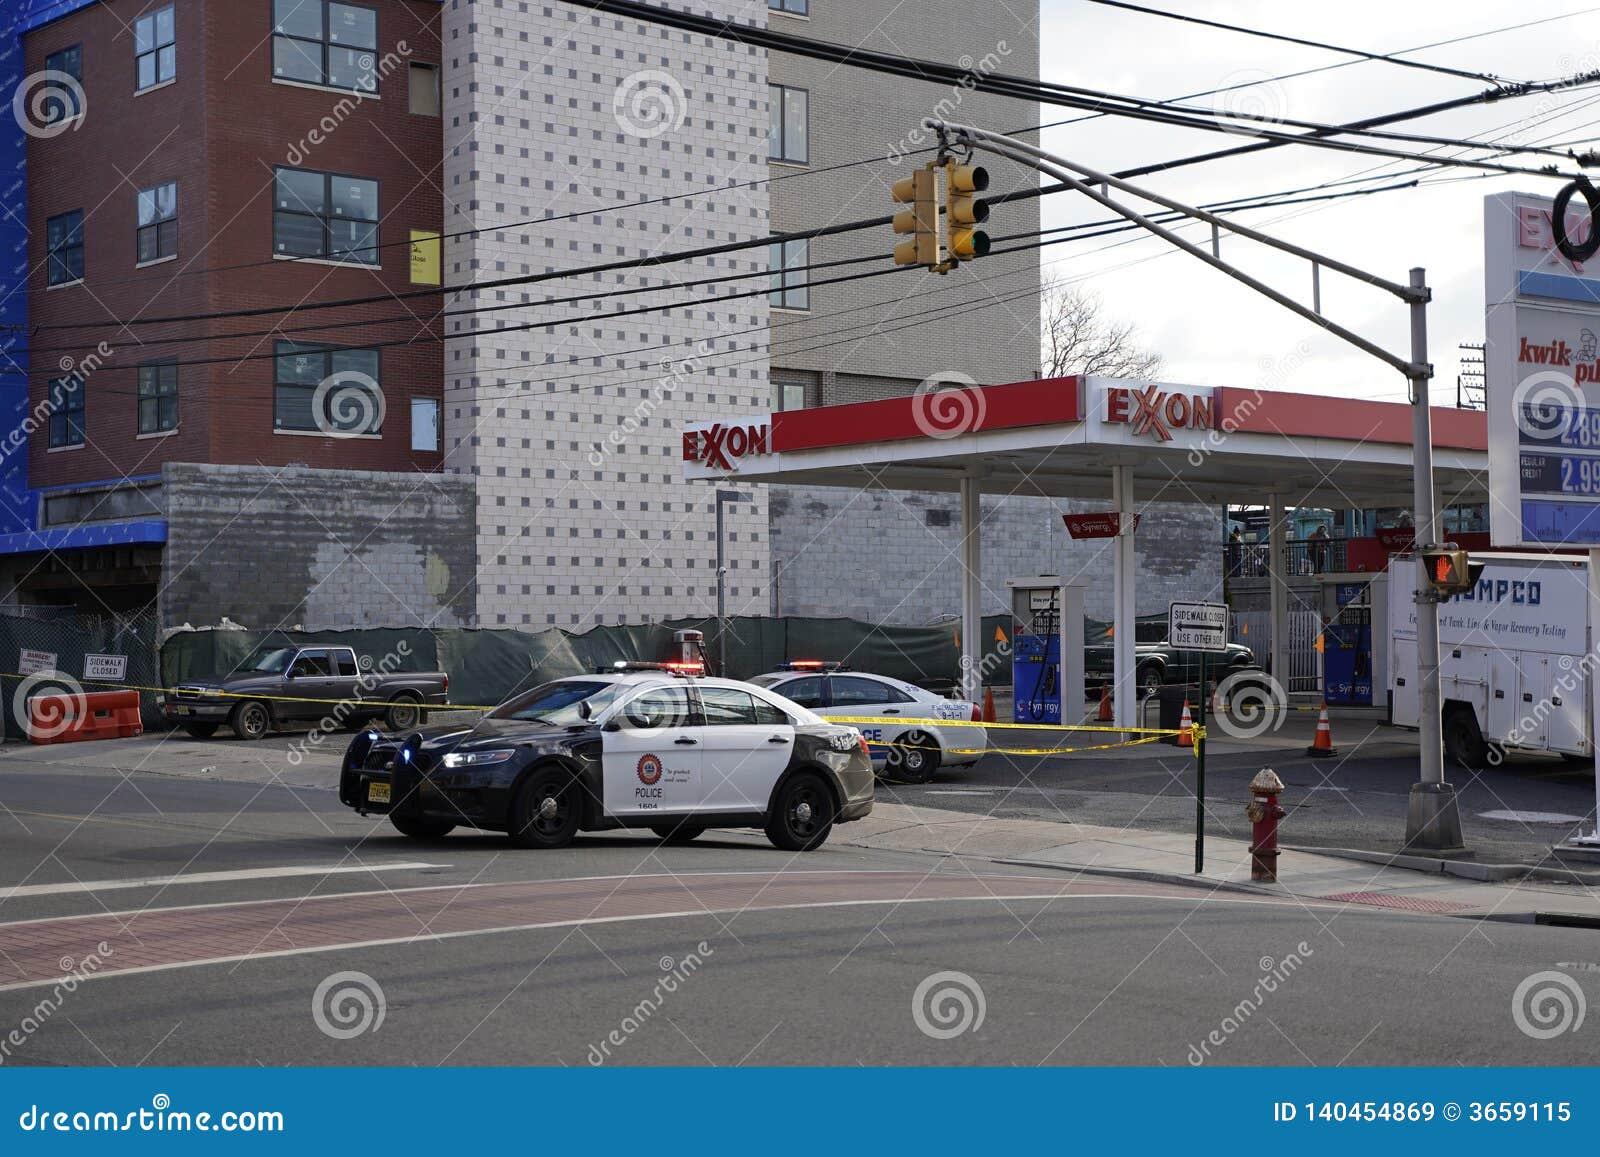 Bayonne, NJ, USA. 02.25.2019 Scaffolding issue near 22nd street light rail station